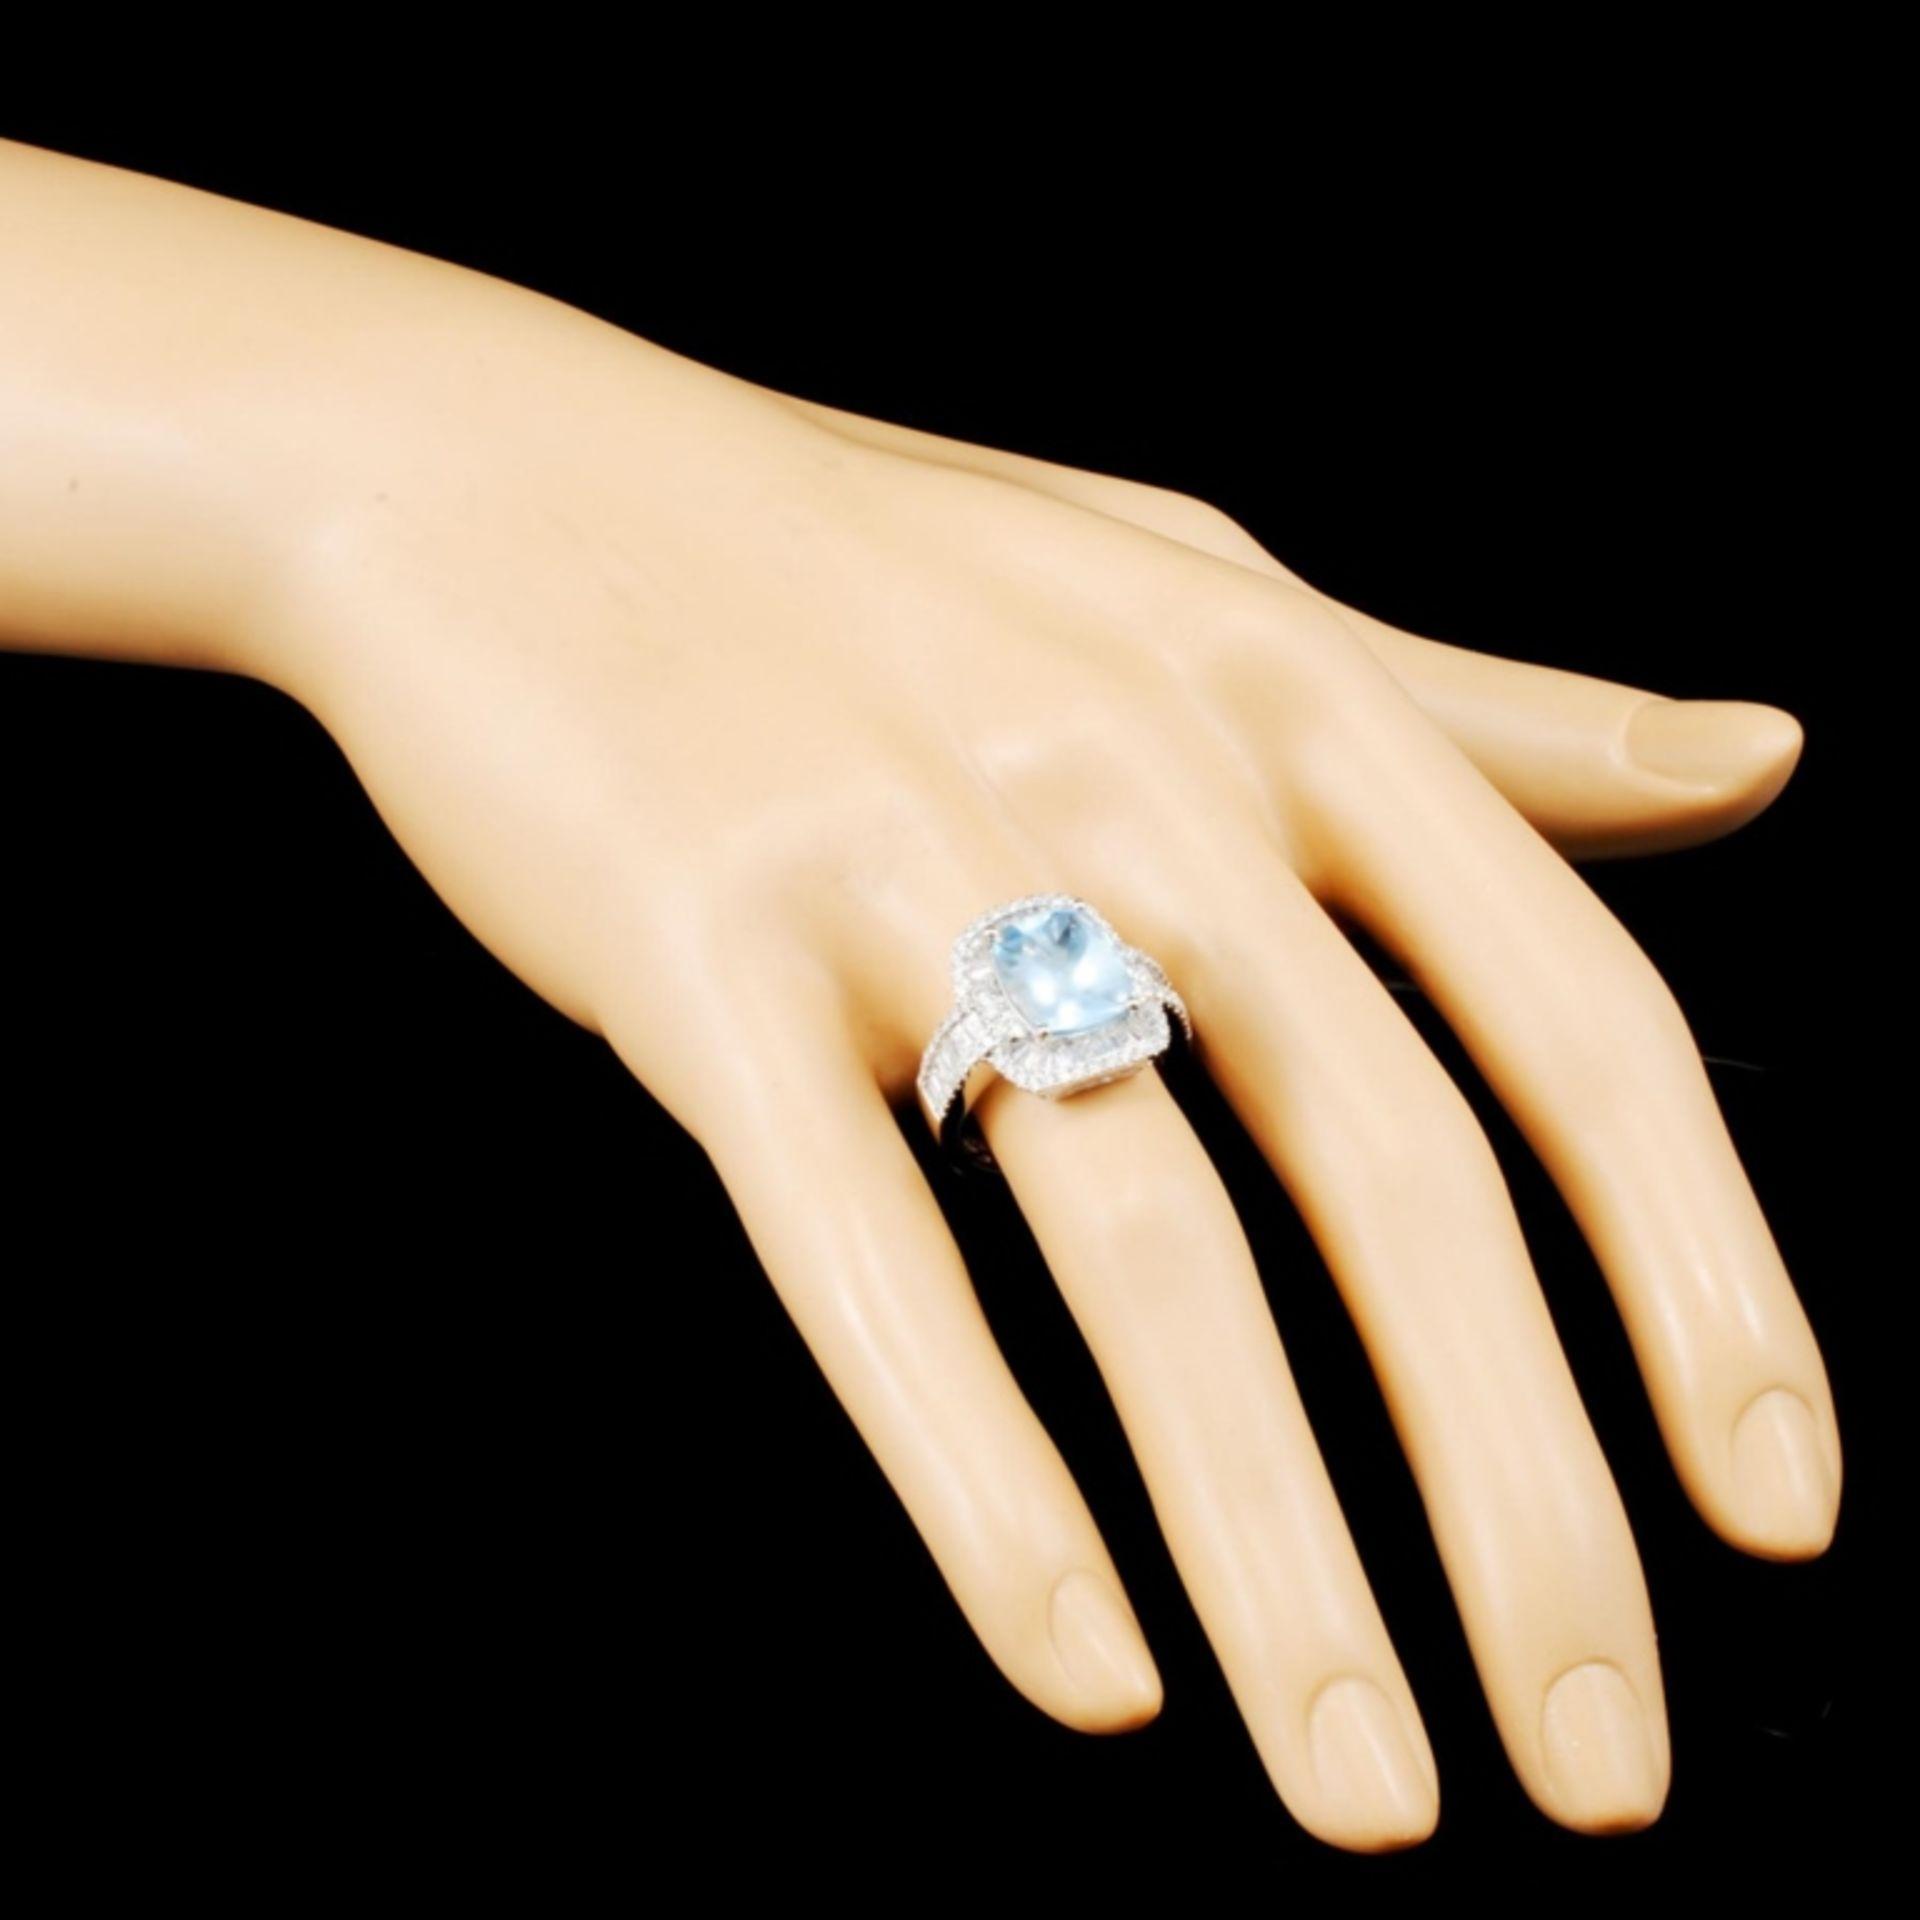 14K Gold 3.43ct Aquamarine & 1.30ctw Diamond Ring - Image 3 of 5